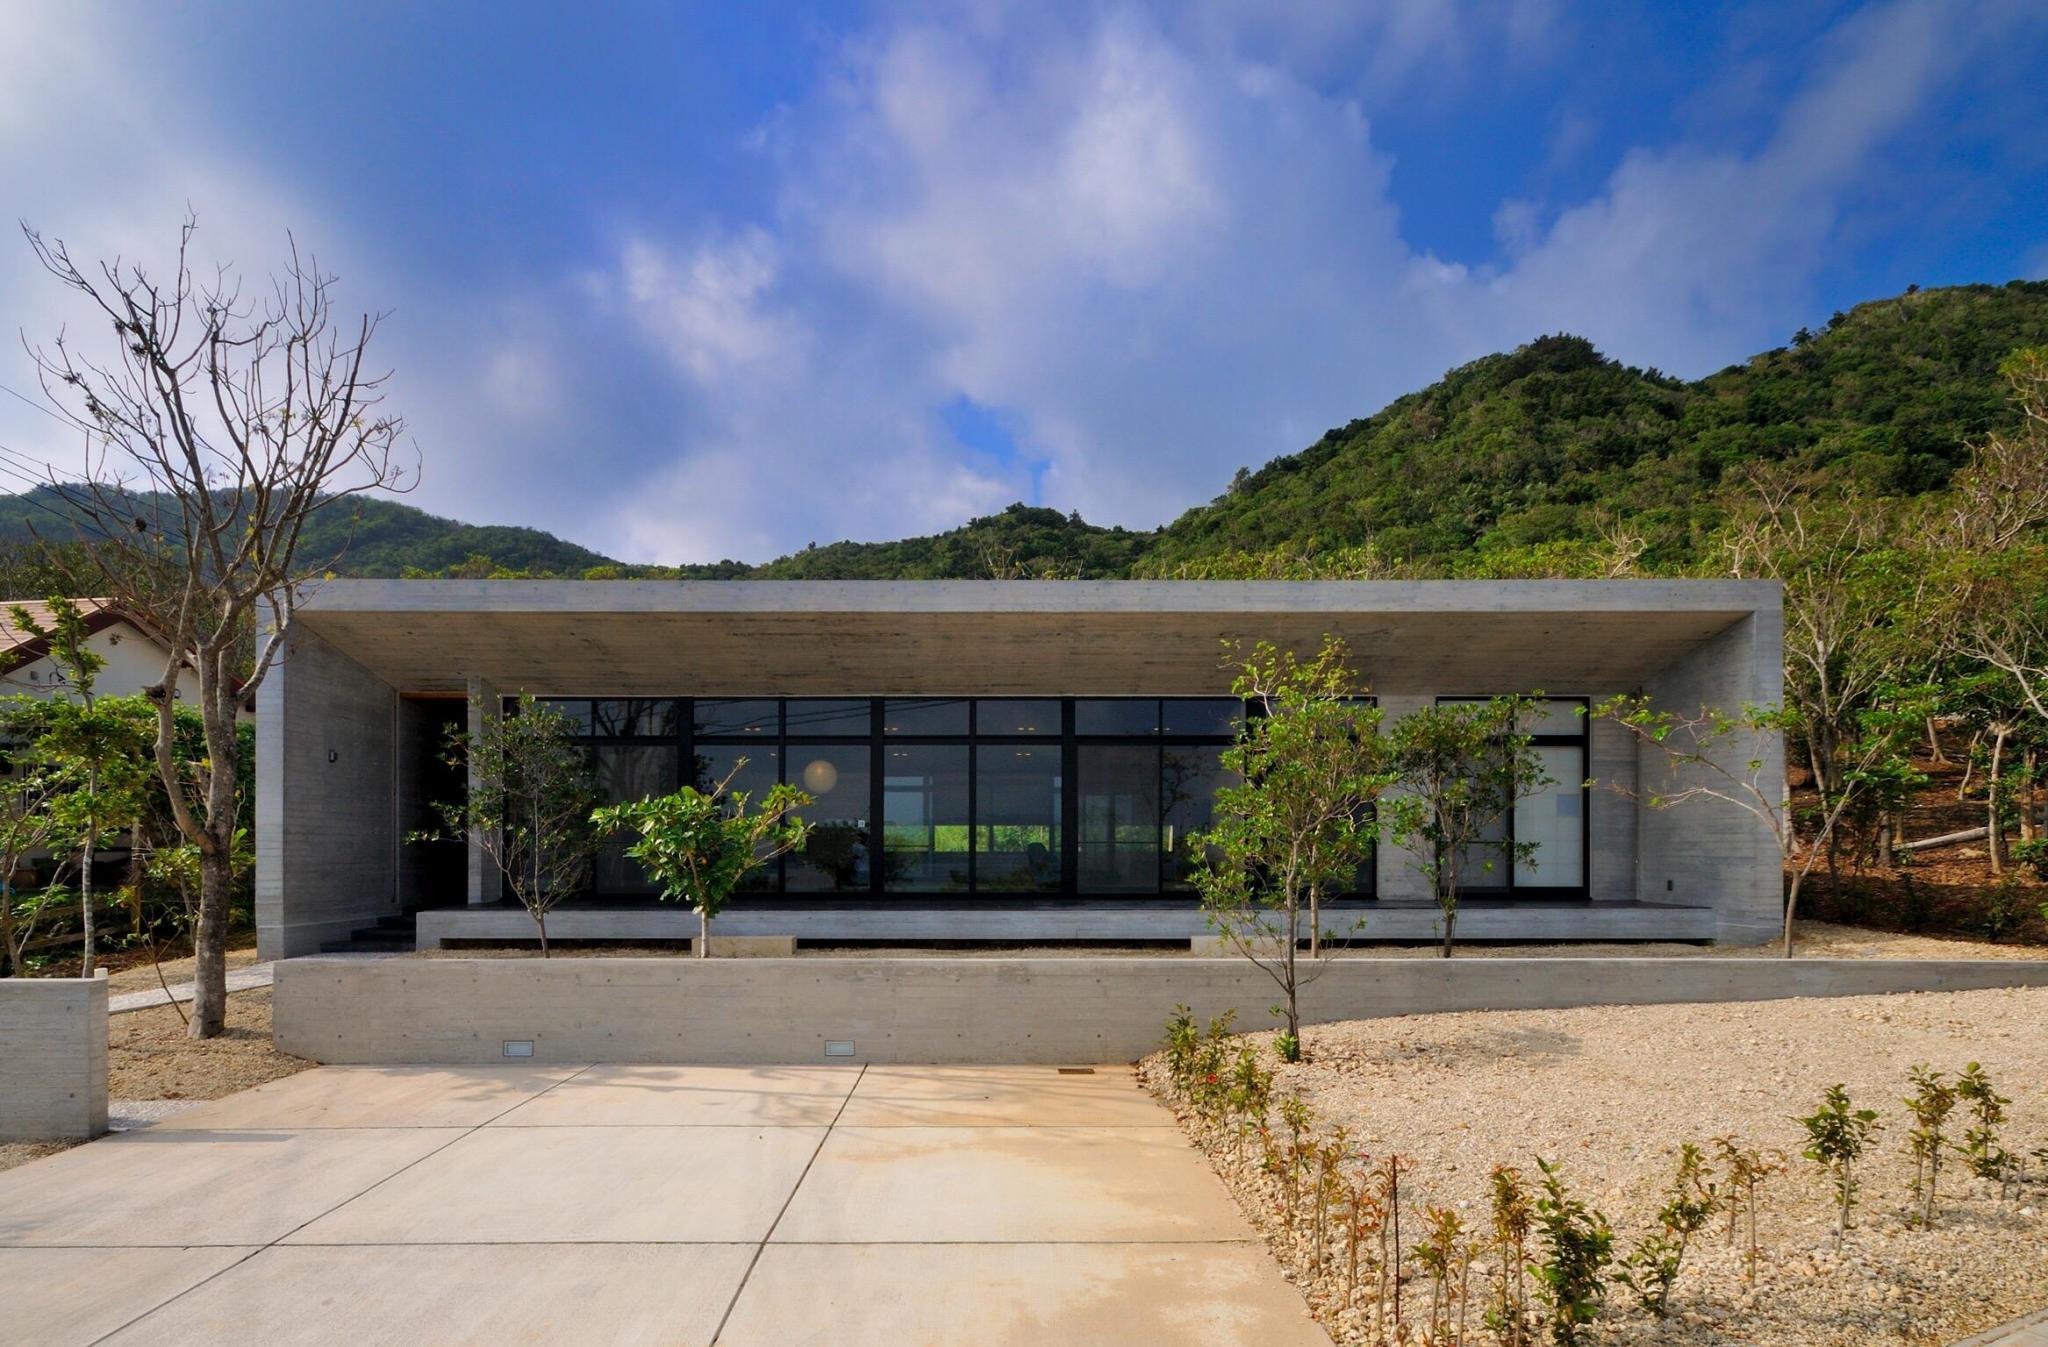 1ldk House Ibaruma Ishigaki Shi Okinawa Japan